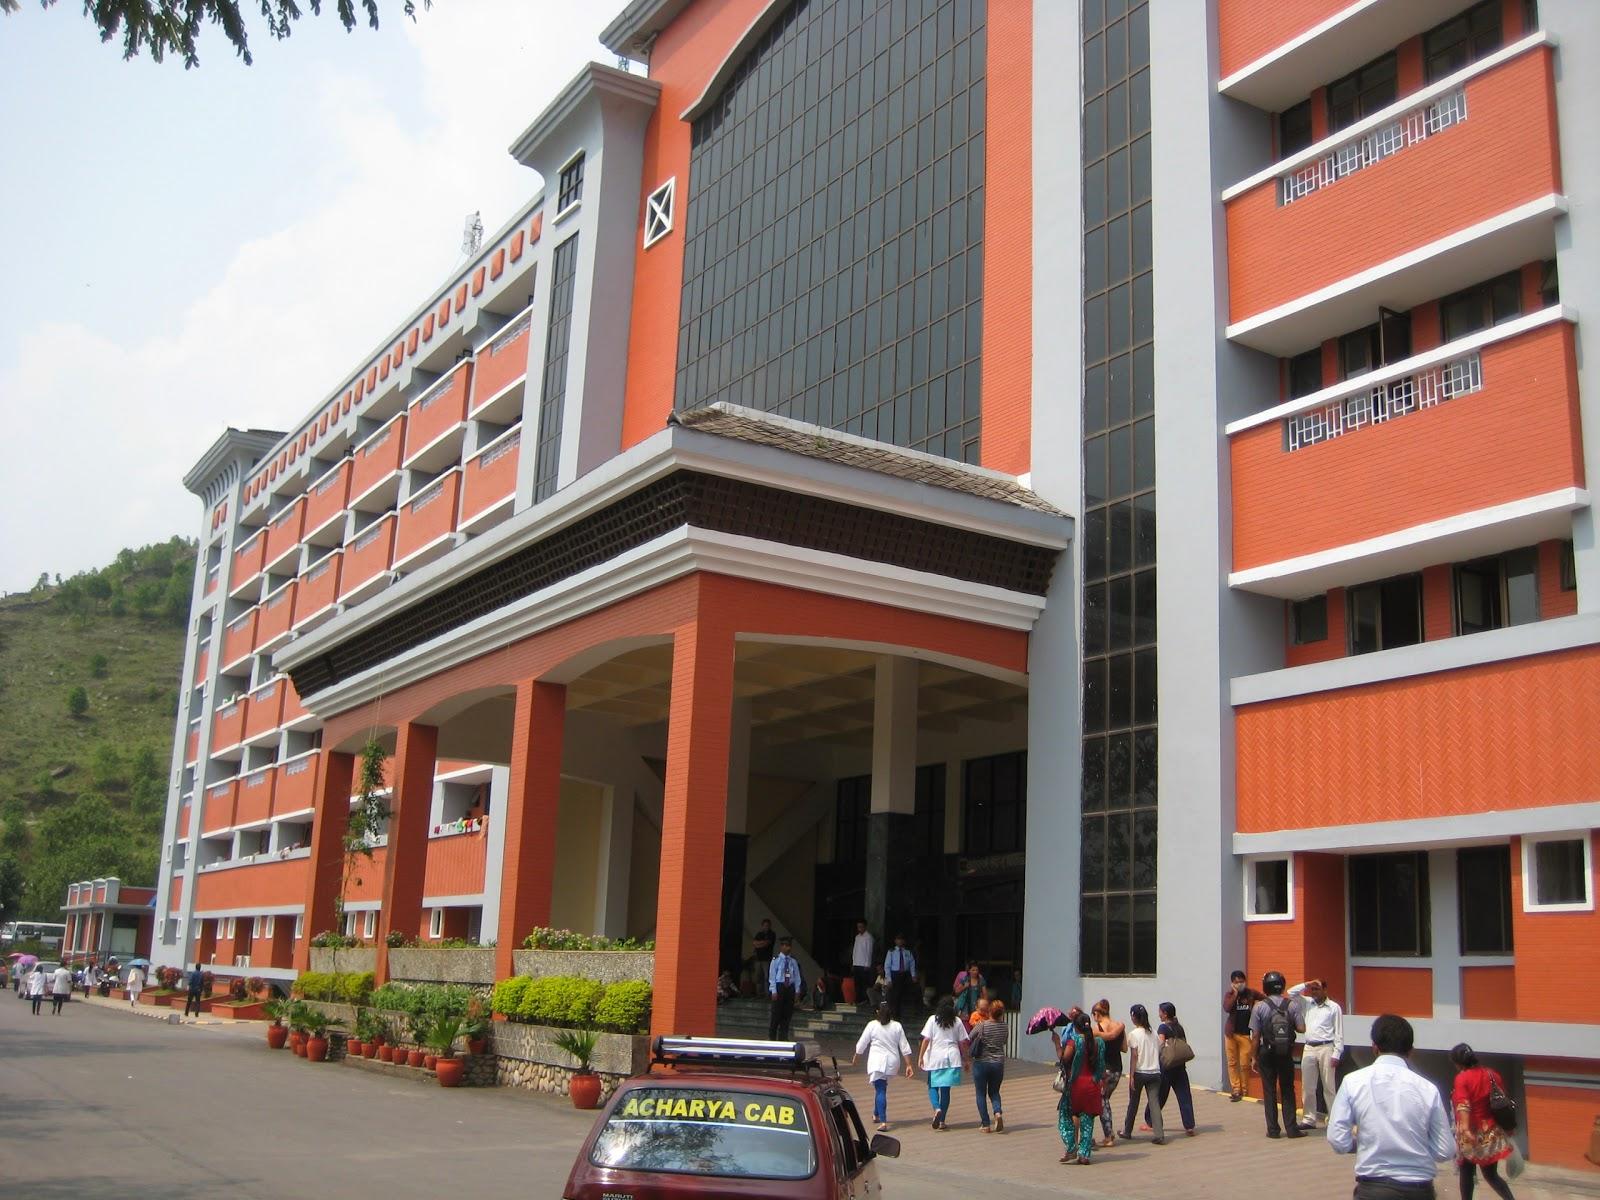 मणिपाल अस्पताल खुलाउन भएको वार्ता निश्कर्षविहीन निश्कासित चार कर्मचारी पुर्नबहाली नगर्ने अस्पतालको अडान